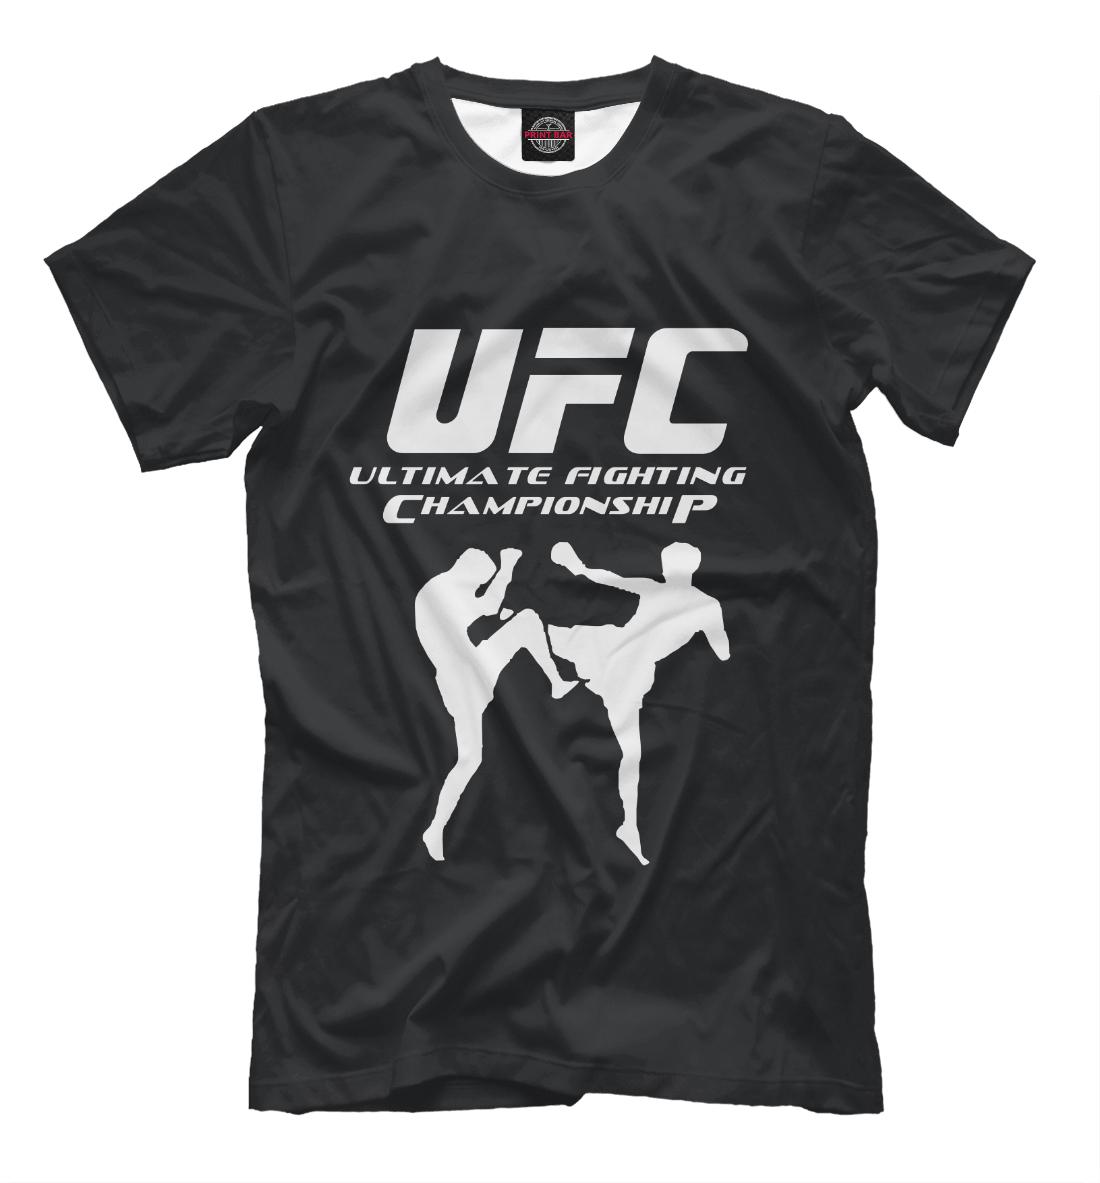 Купить Ultimate Fighting Championship, Printbar, Футболки, MNU-471332-fut-2